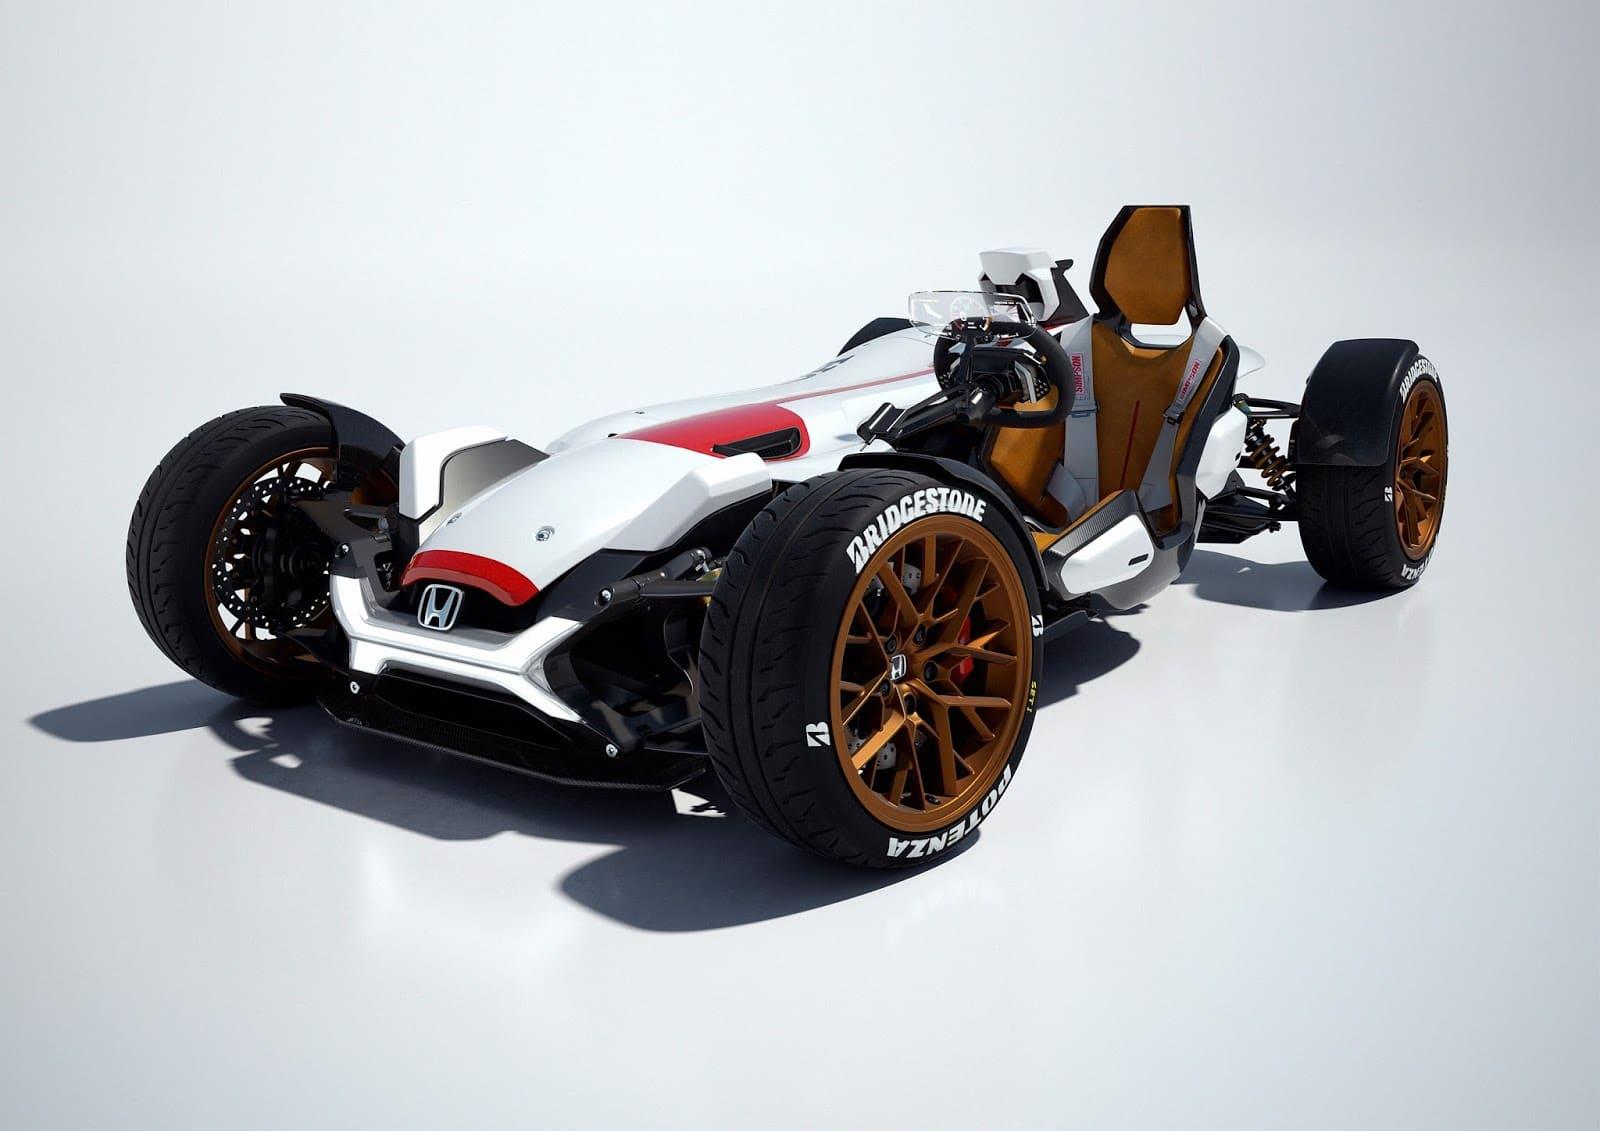 60394 HONDA PROJECT 2 4 POWERED BY RC213V TO DEBUT AT FRANKFURT A COMBINATION OF Αυτοκίνητο ή μοτοσικλέτα; Και τα δυο σε ένα μας λέει η Honda Frankfurt Motor Show, Global Design Project, Honda, Honda design, Honda Project 2&4